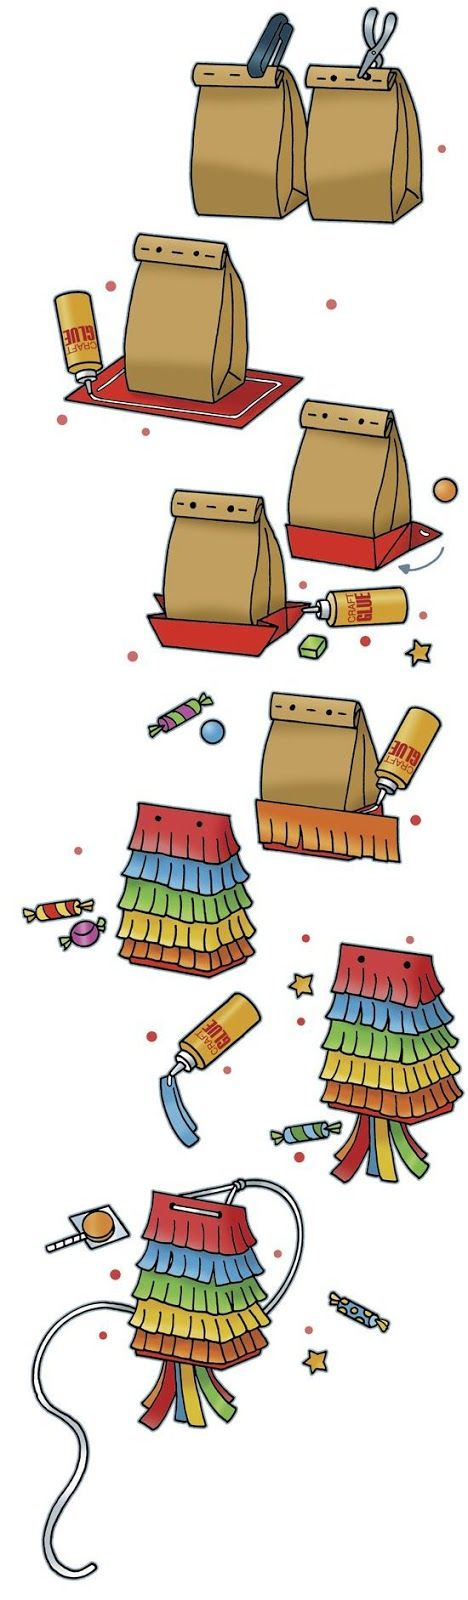 Tutorials and DIYs: Making piñata for birthdays